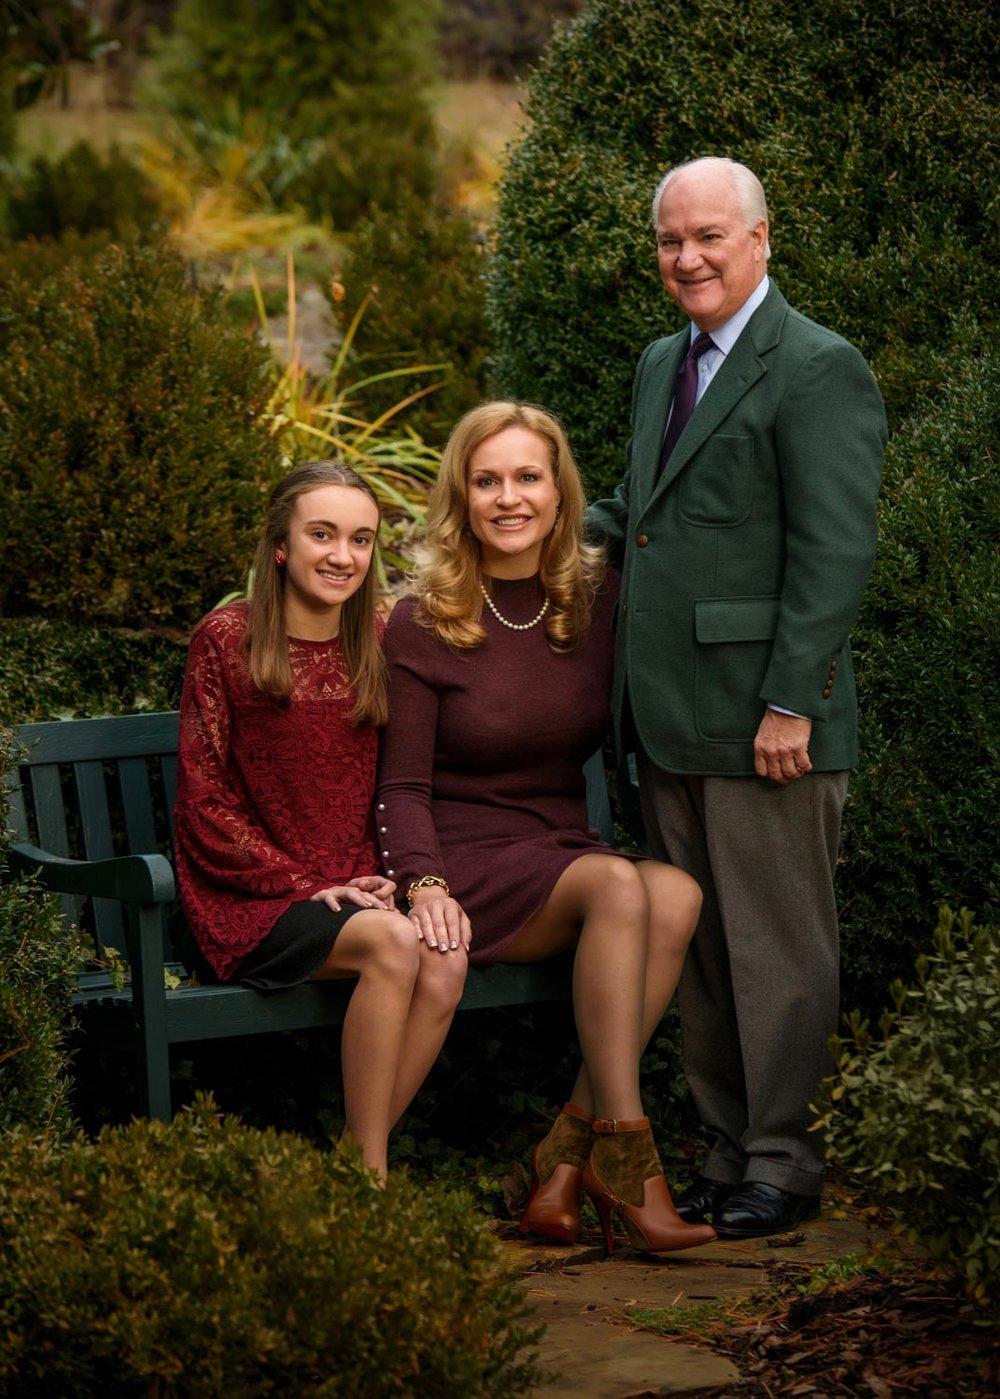 family-photography-Lexington-ky-studio-walz022.jpg